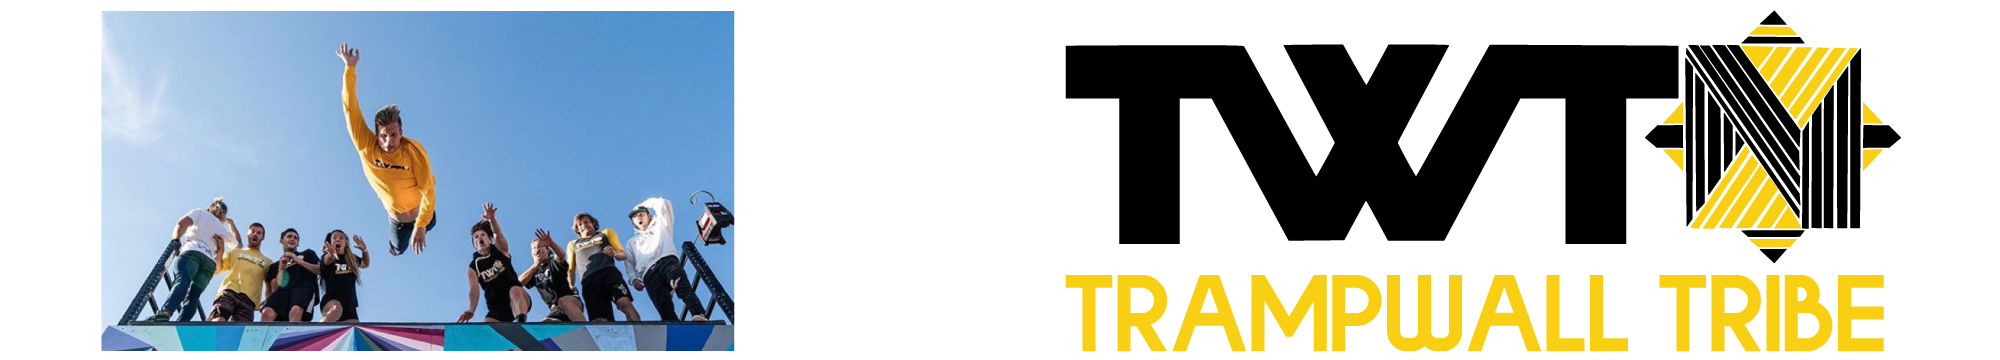 Trampwall Tribe